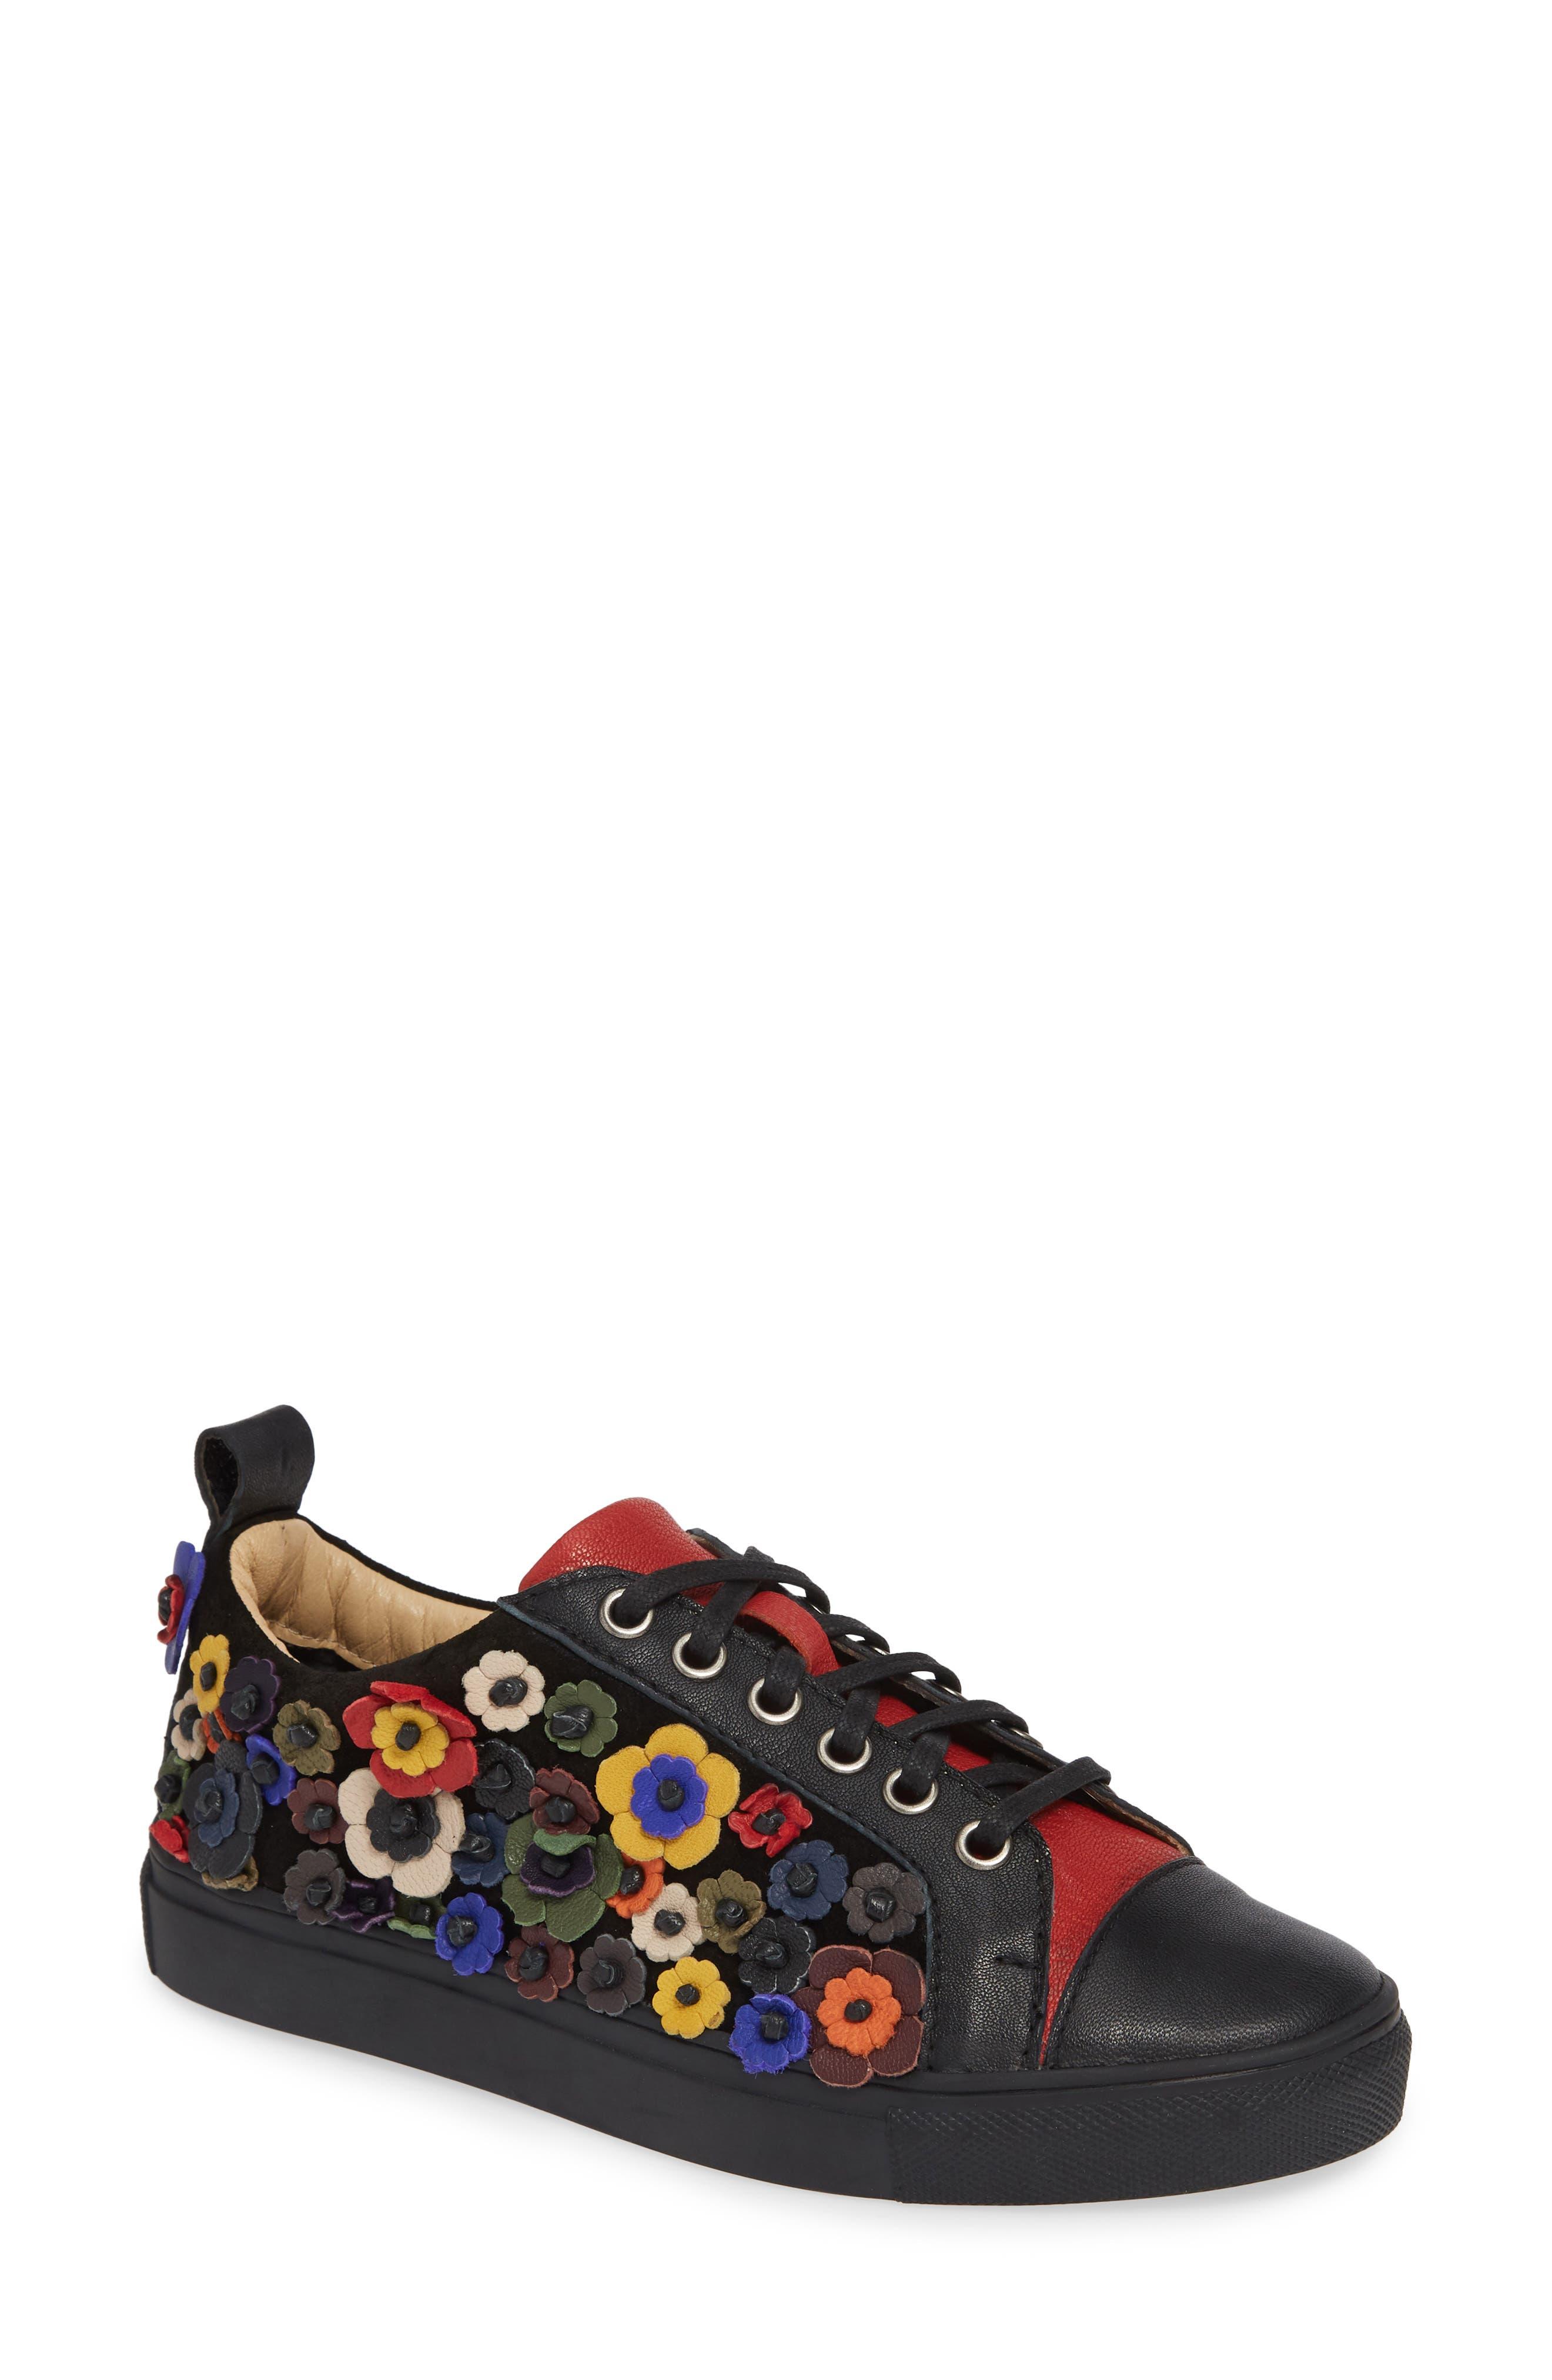 Sheridan Mia Satyr Sneaker - Black